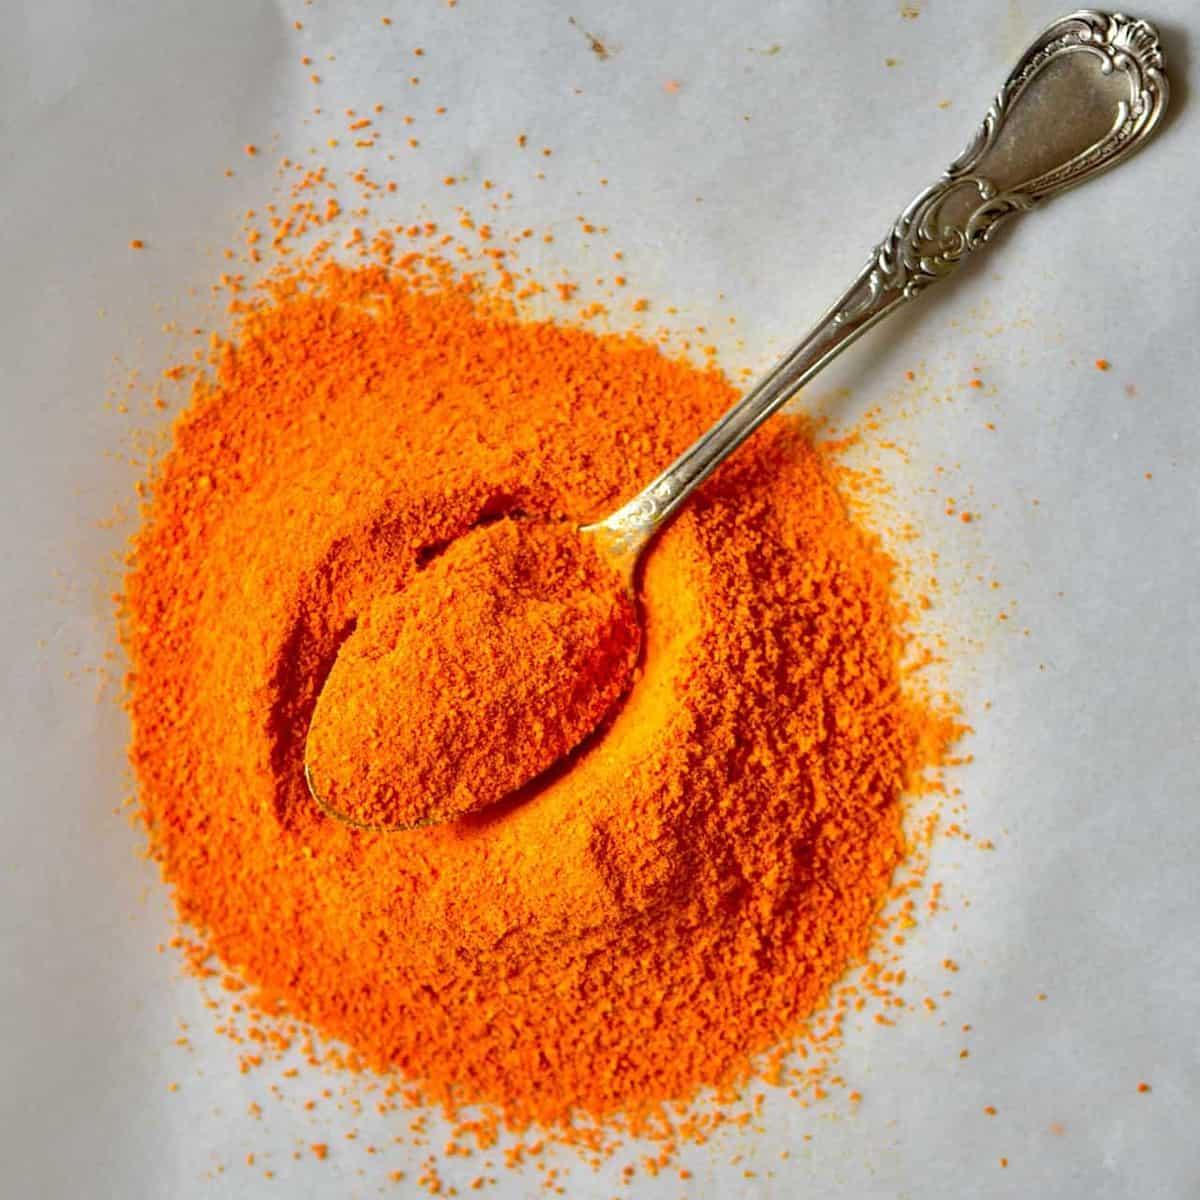 Square photo turmeric powder